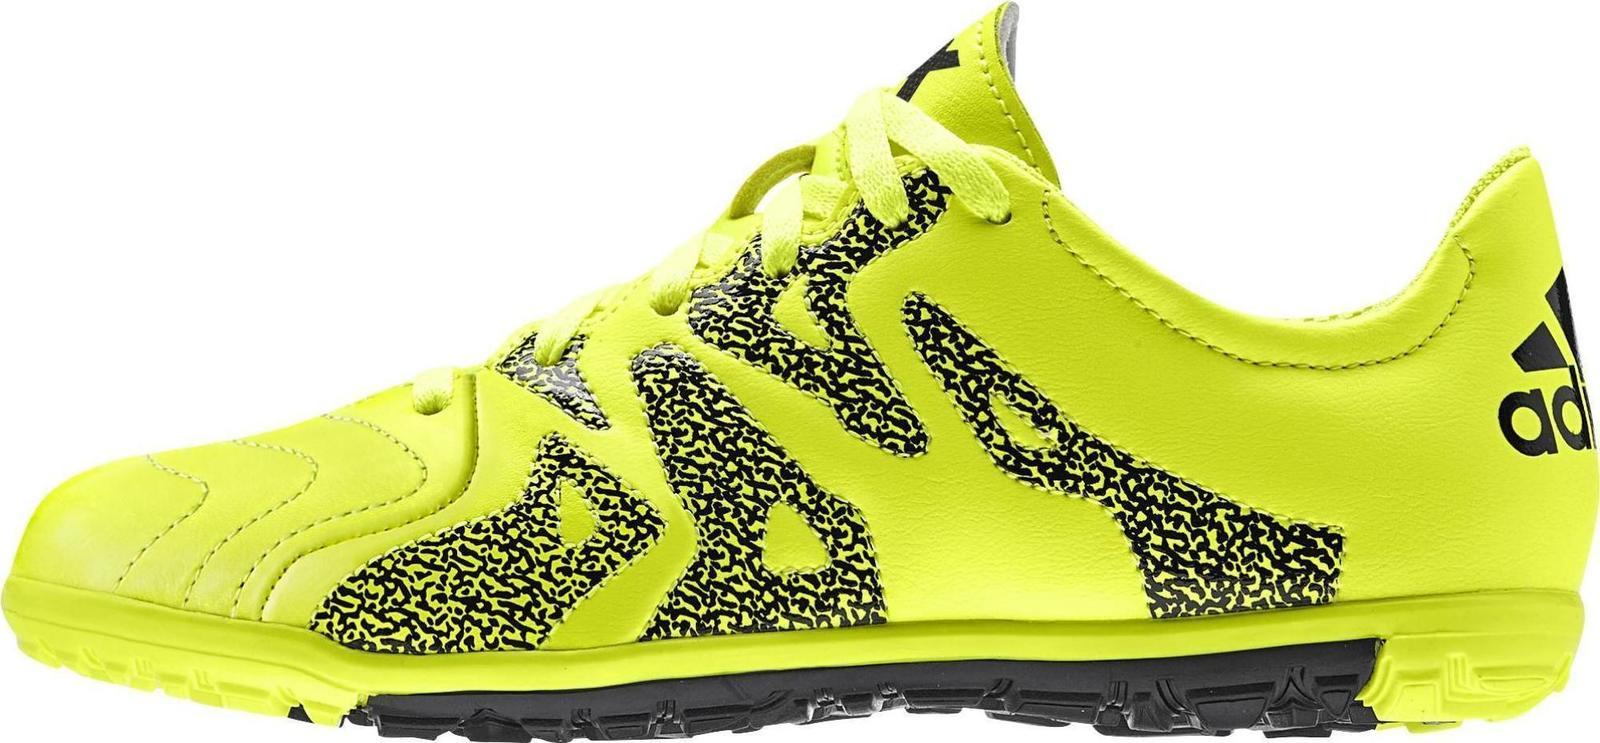 quality design 17fe3 59484 Adidas X 15.3 TF B33006